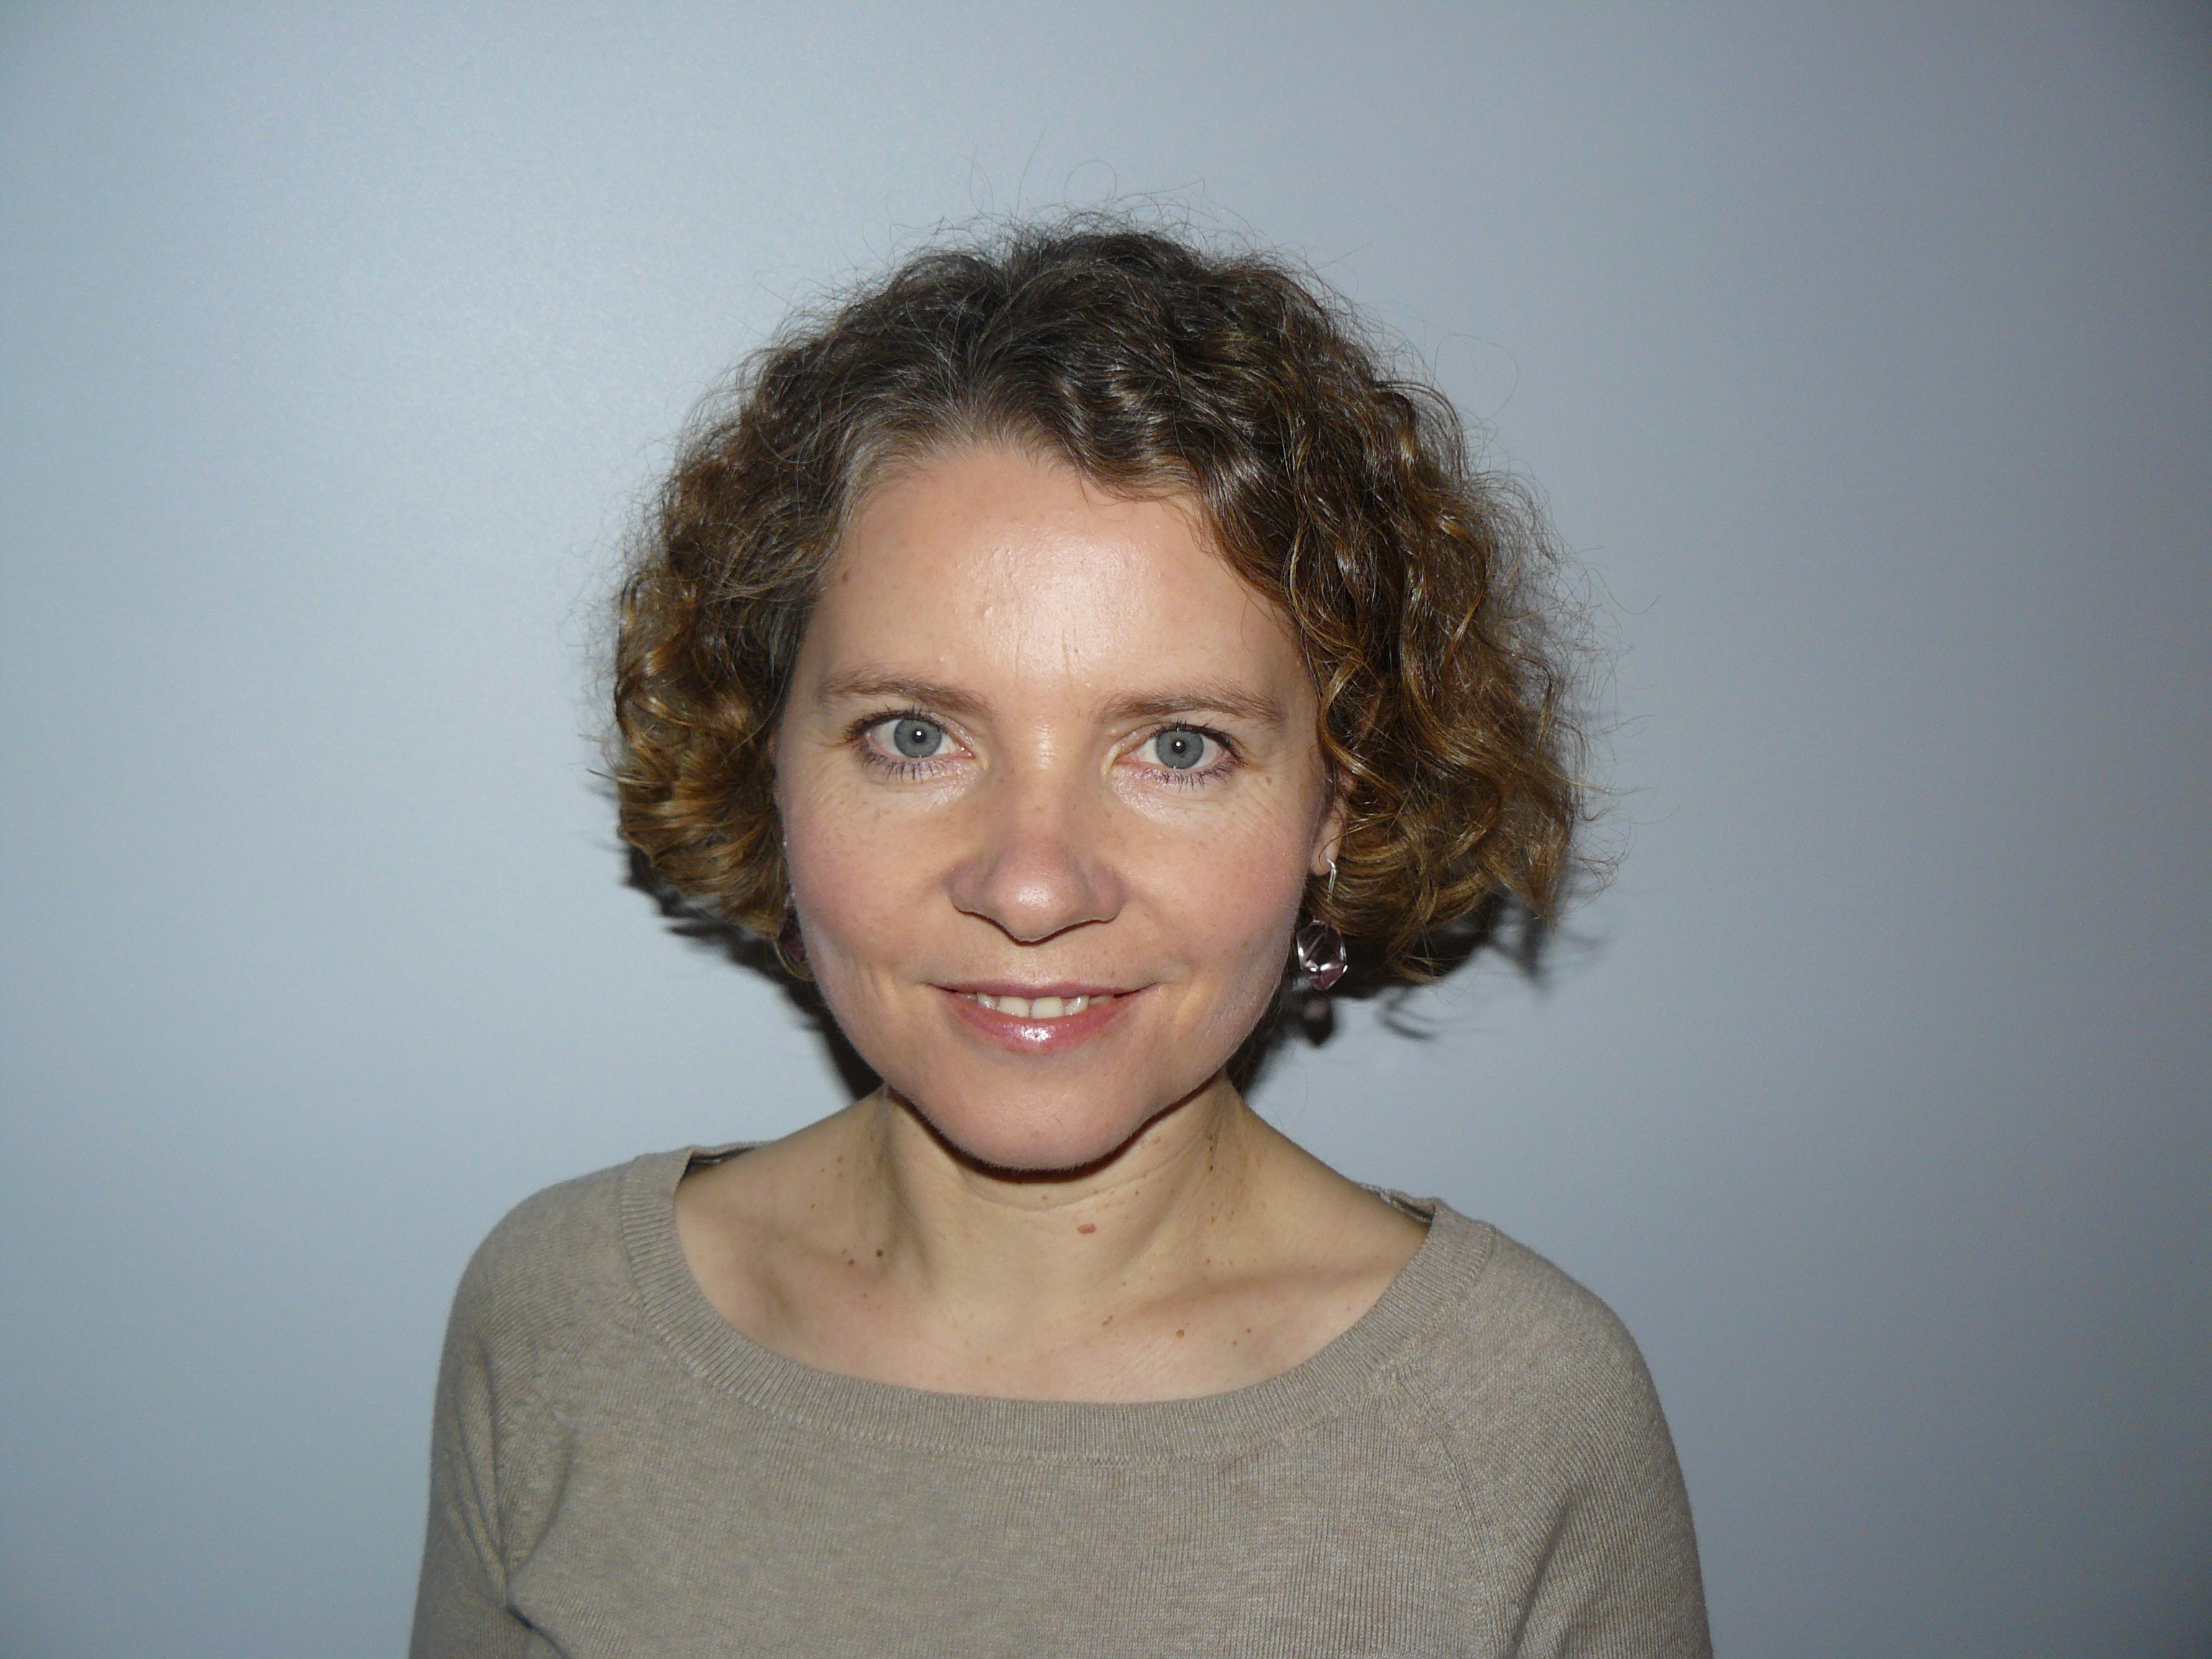 Agnieszka Kuczewska